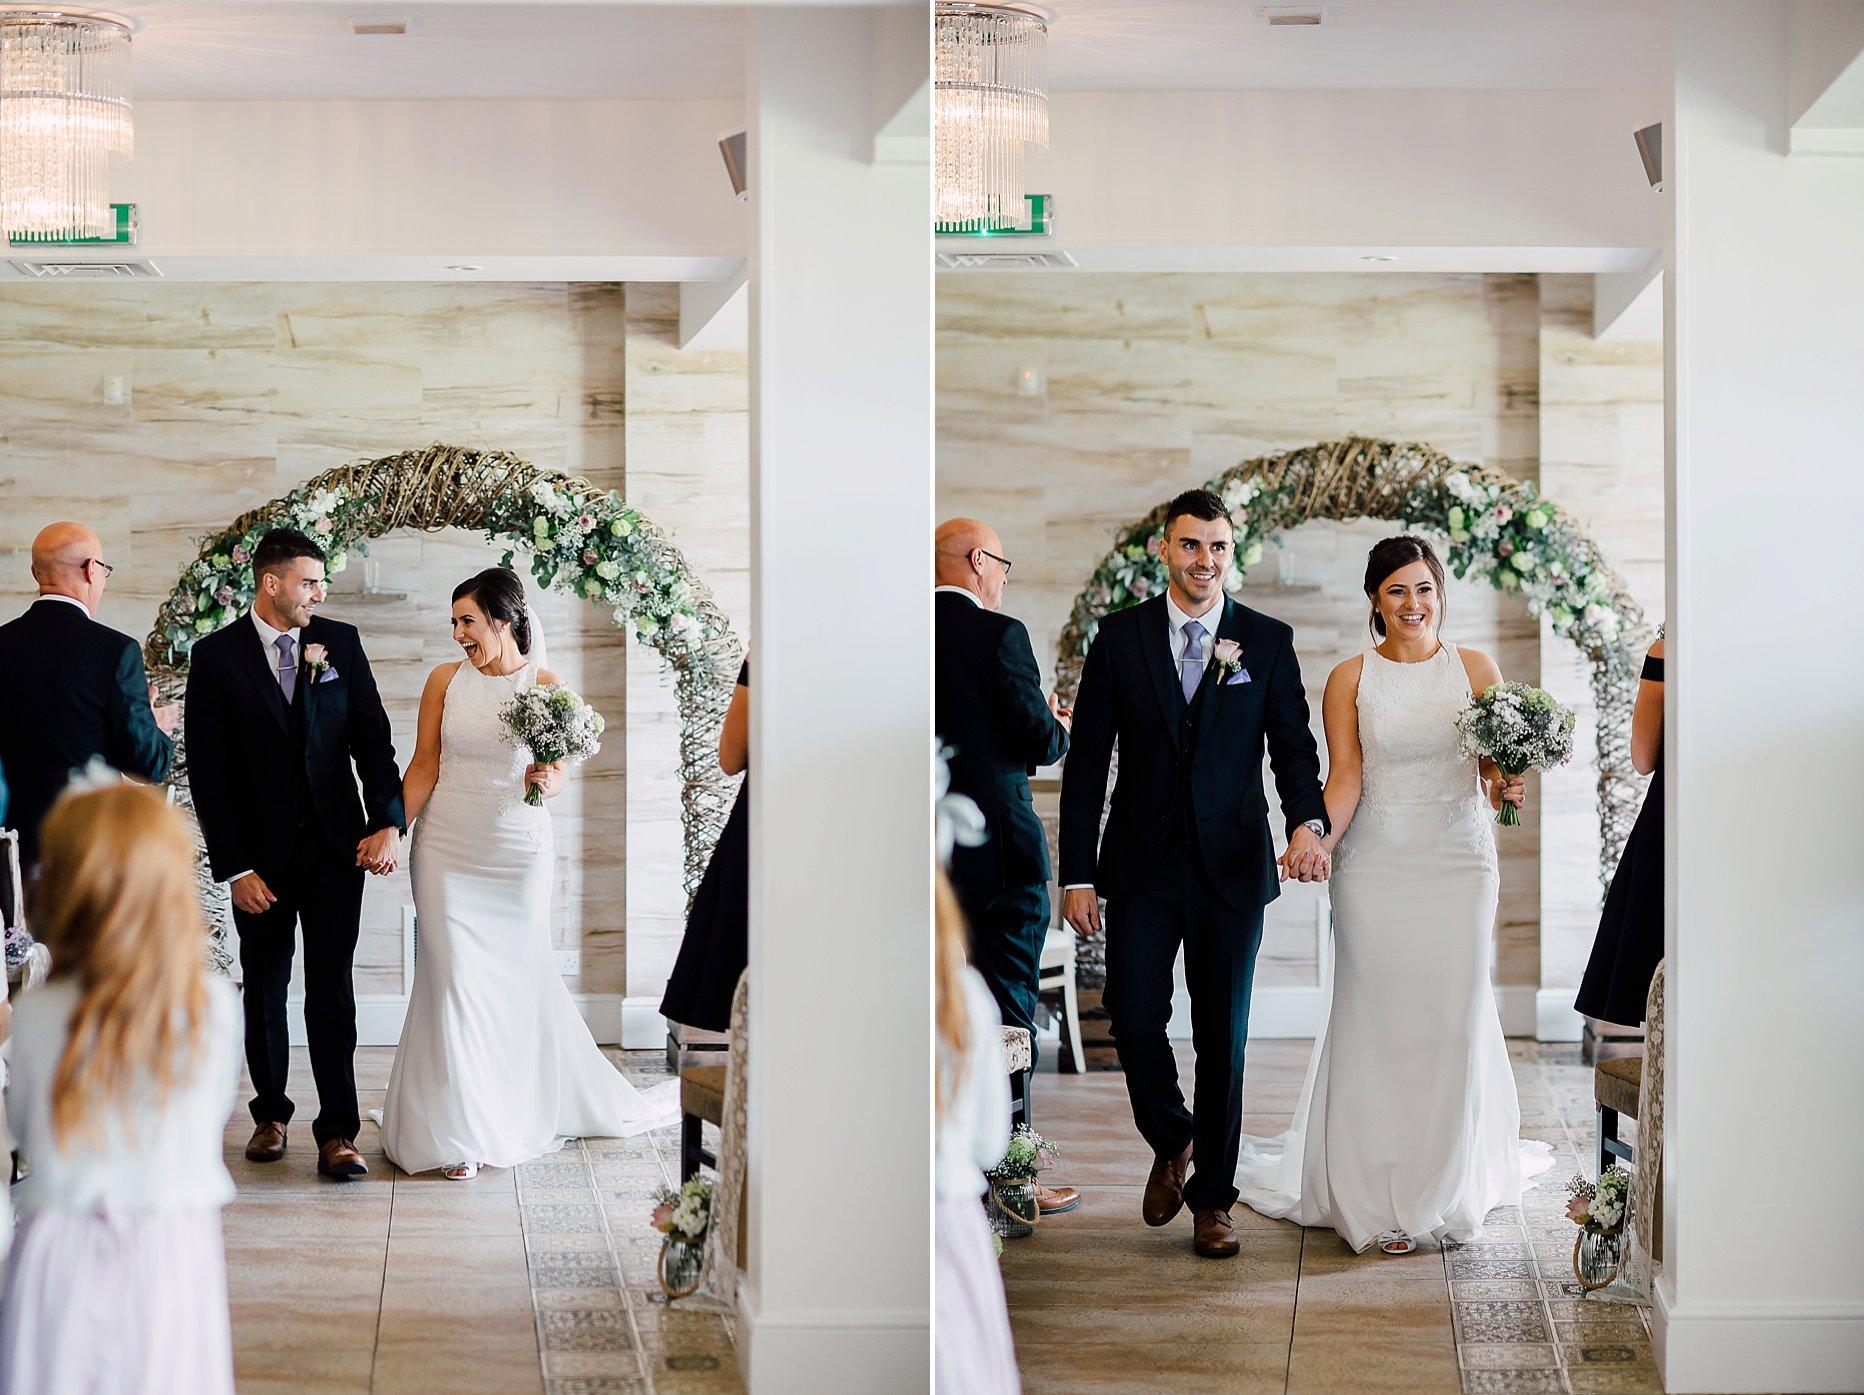 Lindsay Ellis Wedding.Skidby Mill Wedding Lindsay And Ellis 0037 Sarah Beth Photo